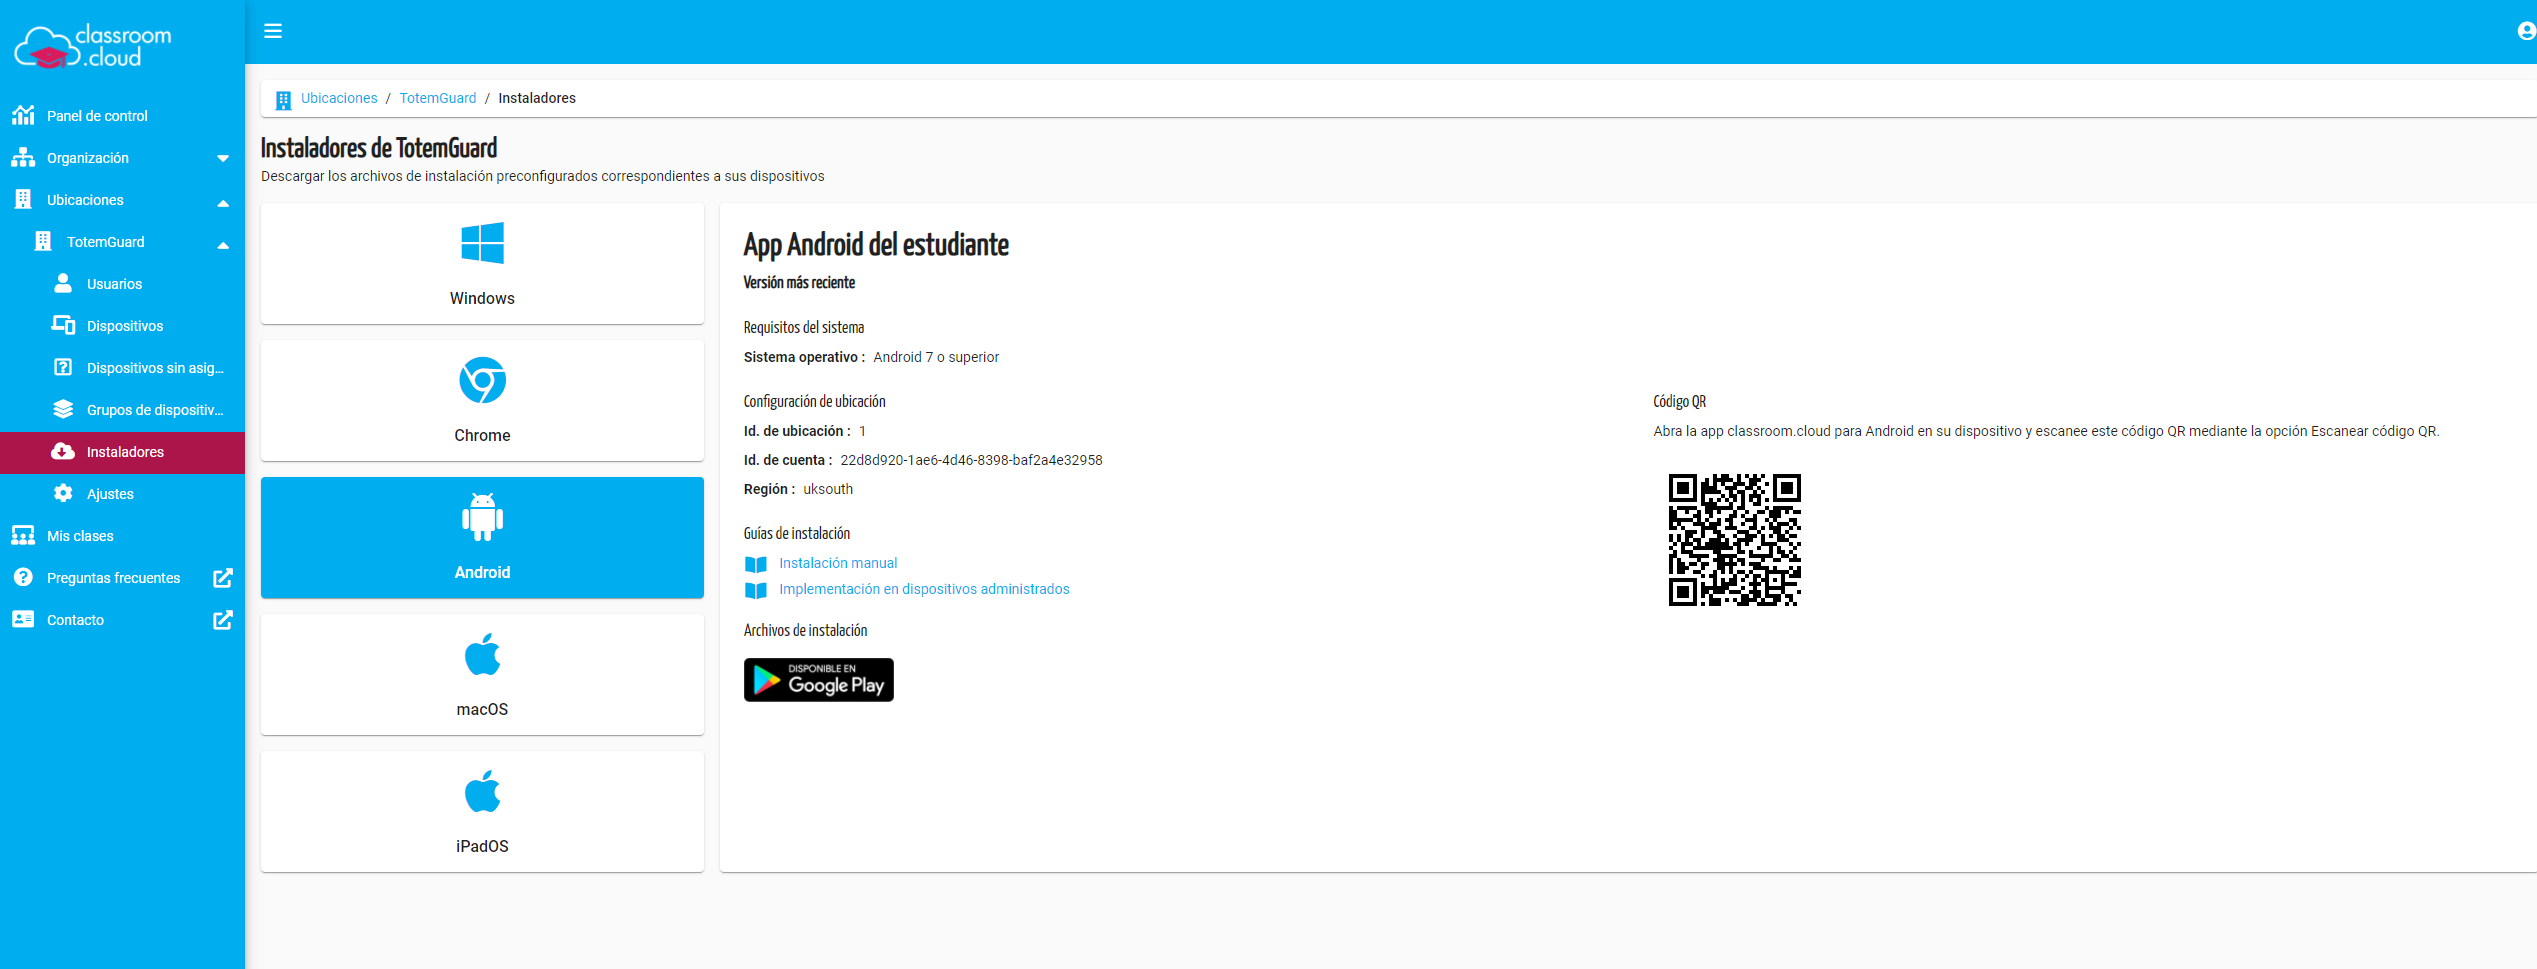 Classroom Cloud Estudiante Android